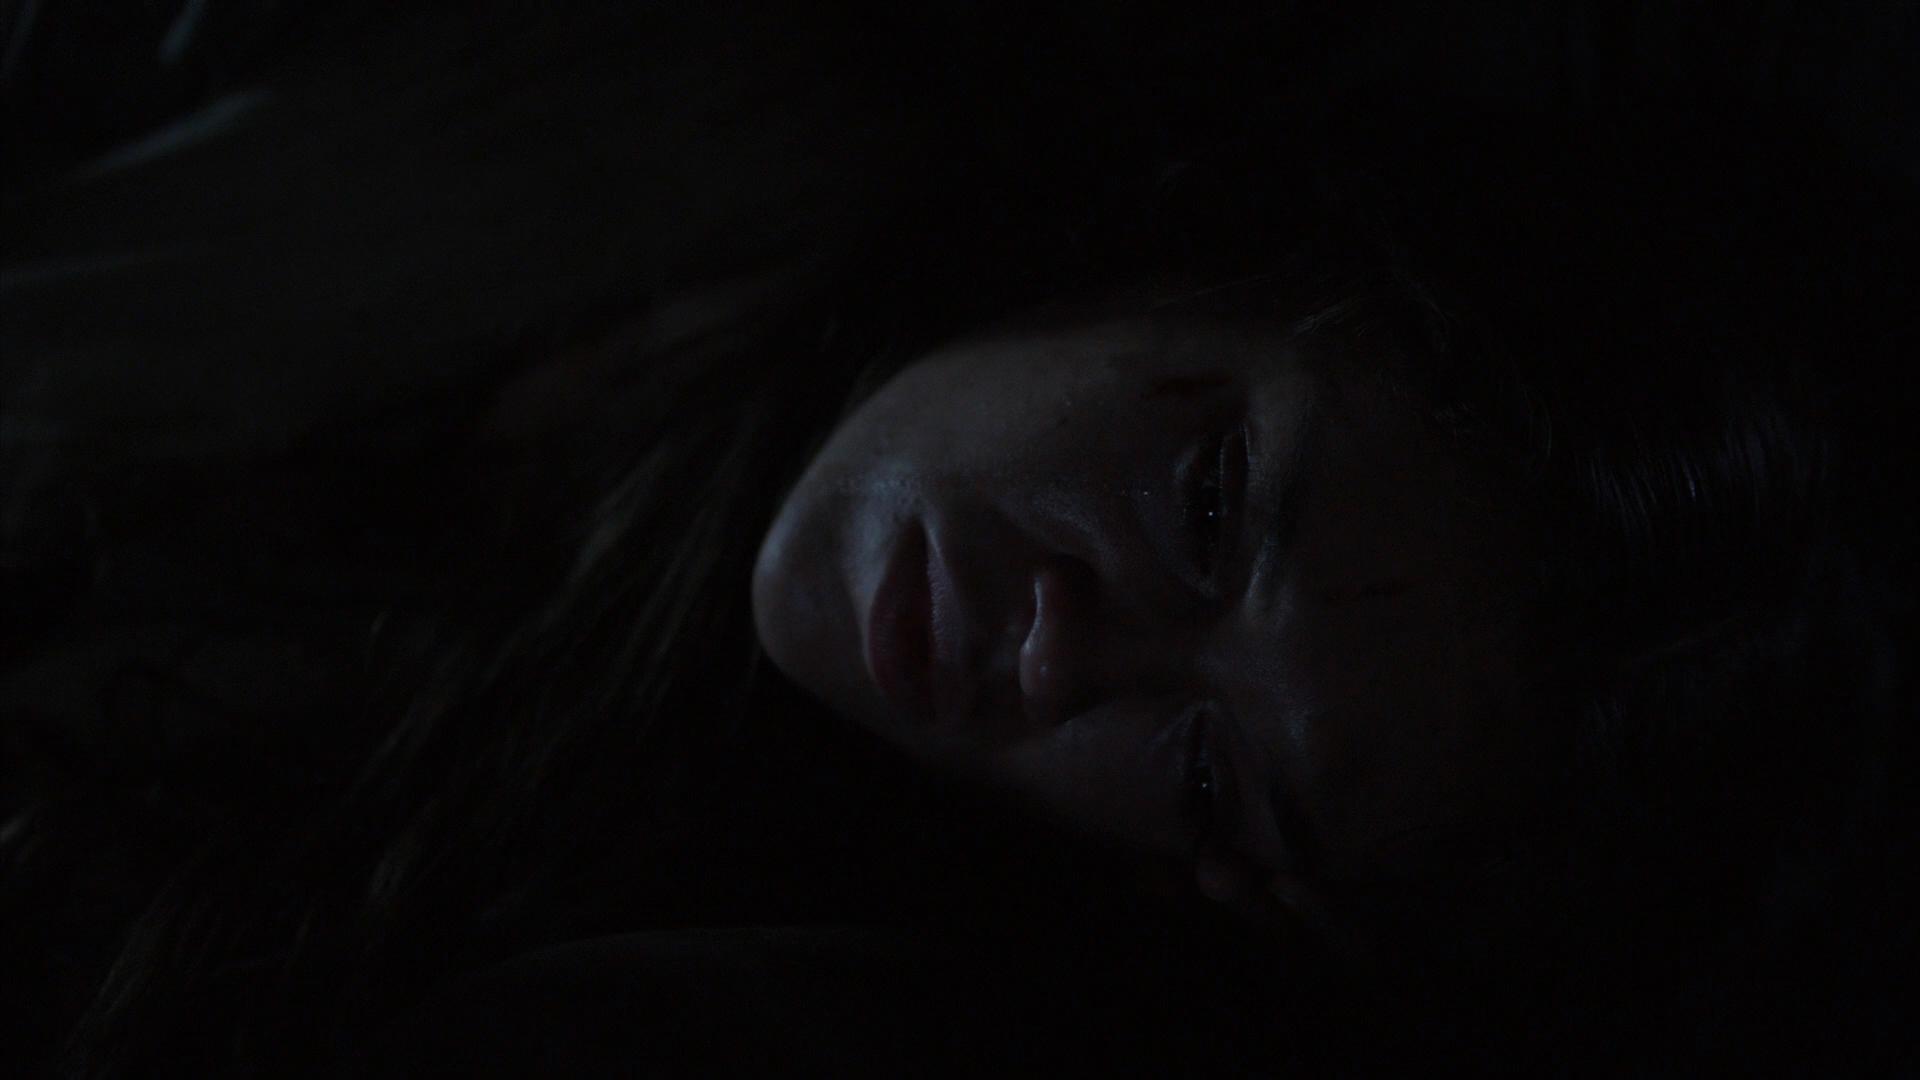 Da.Vincis.Demons.S03E06.1080p.BluRay.x264-ROVERS.mkv_snapshot_14.39.000.jpg